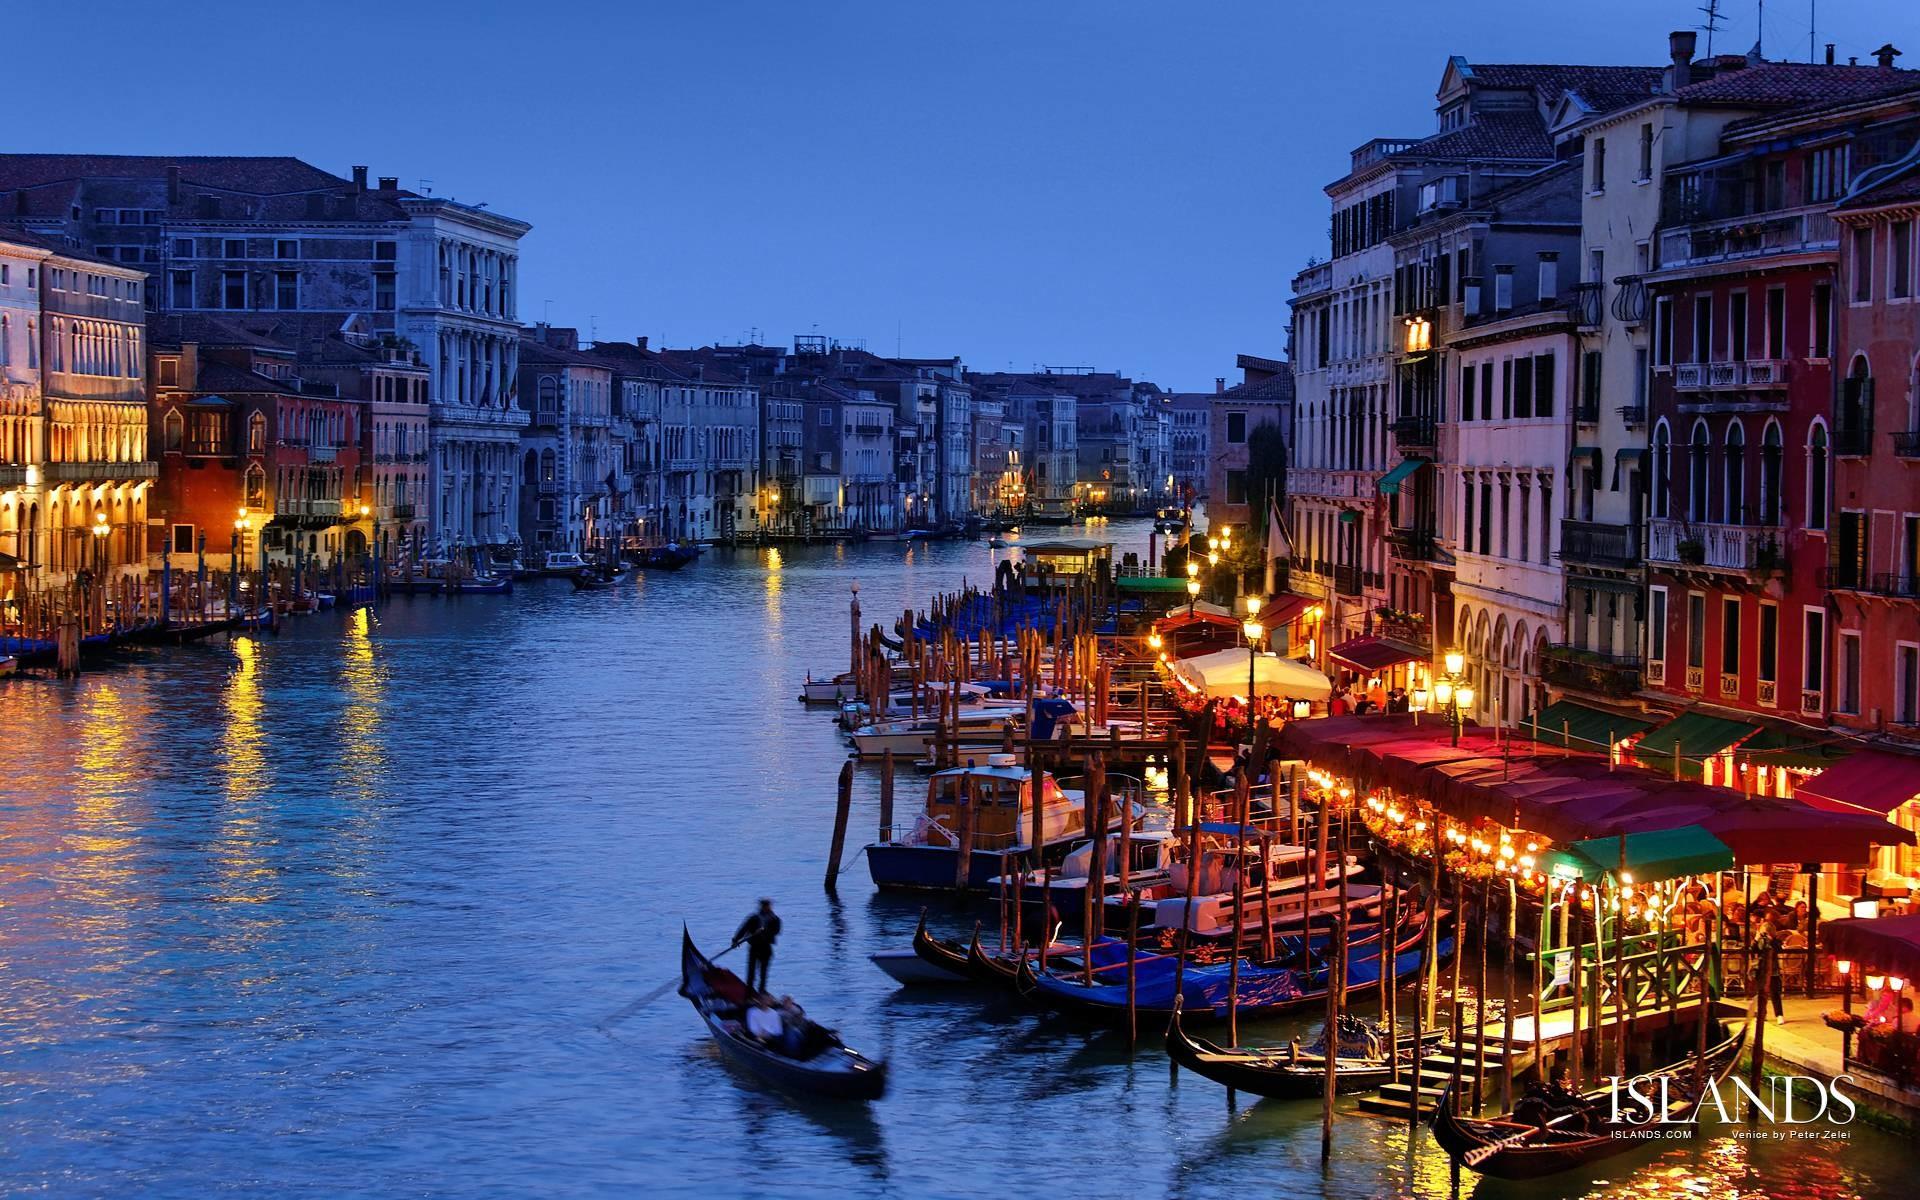 Venice Italy Desktop Wallpaper 54 images 1920x1200